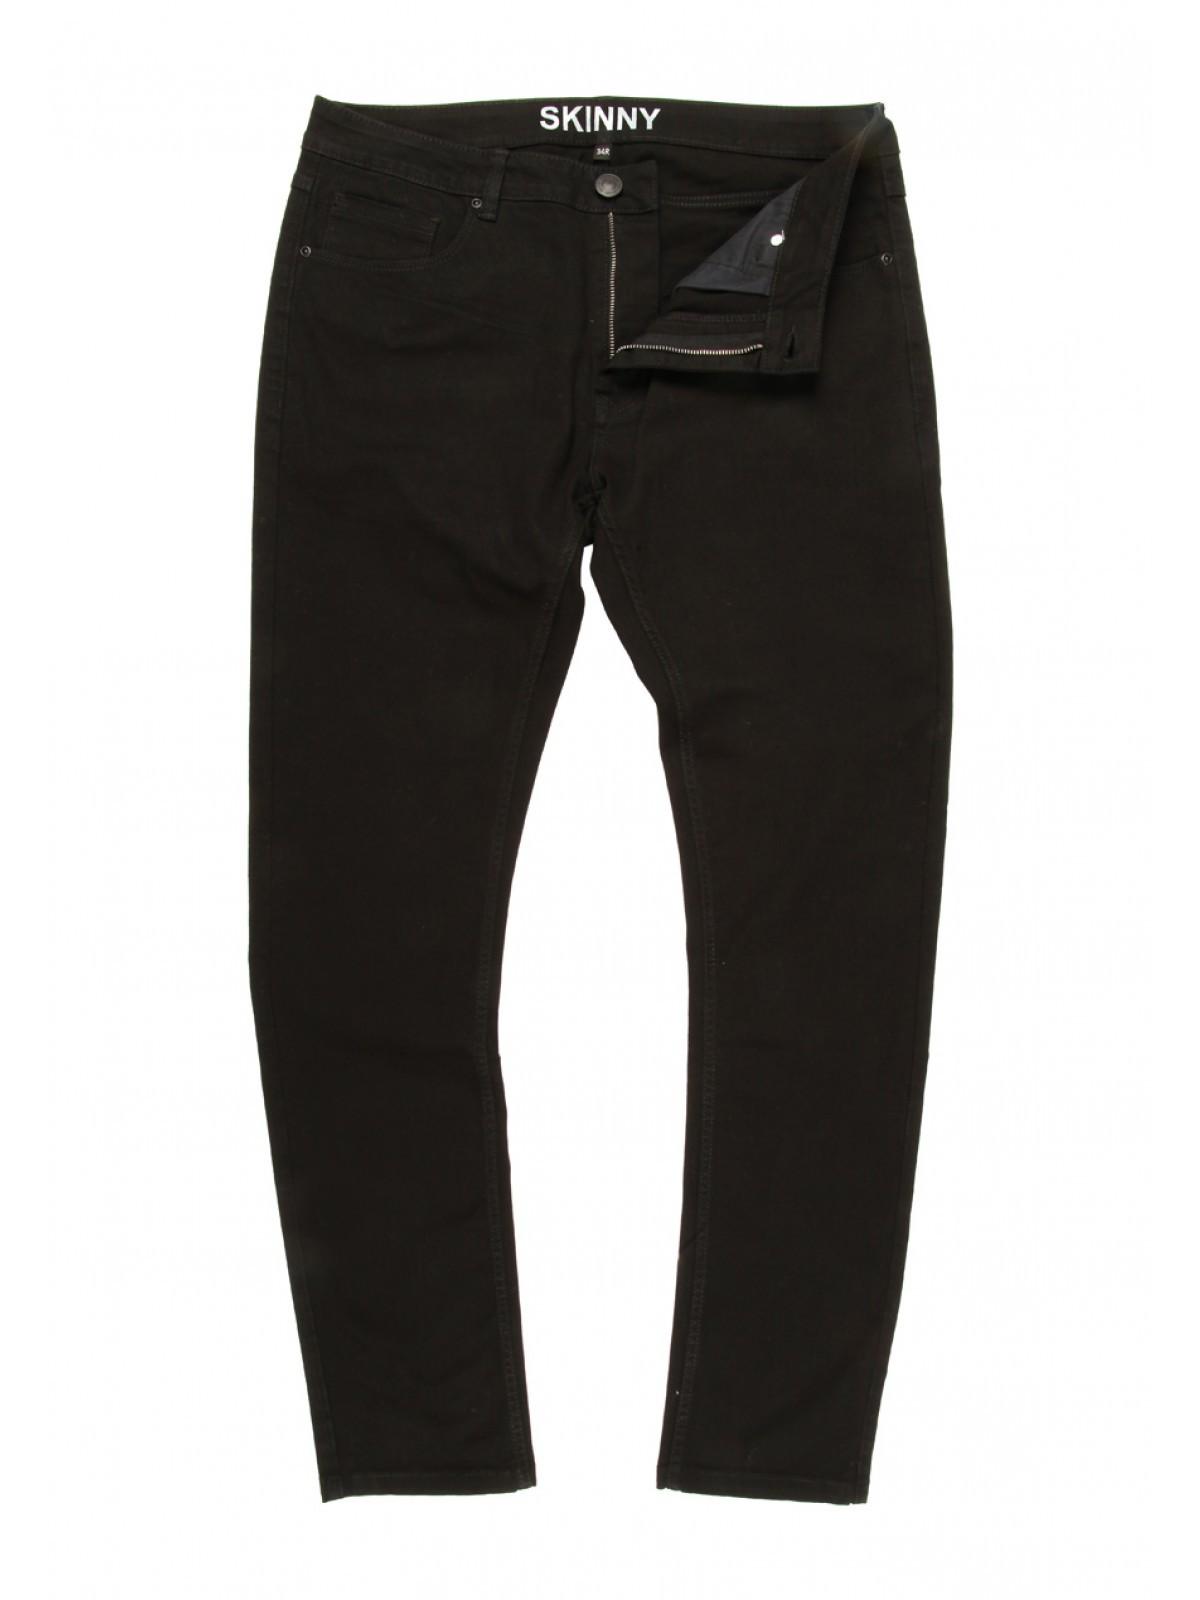 Modern Stretch Skinny Black Jeans